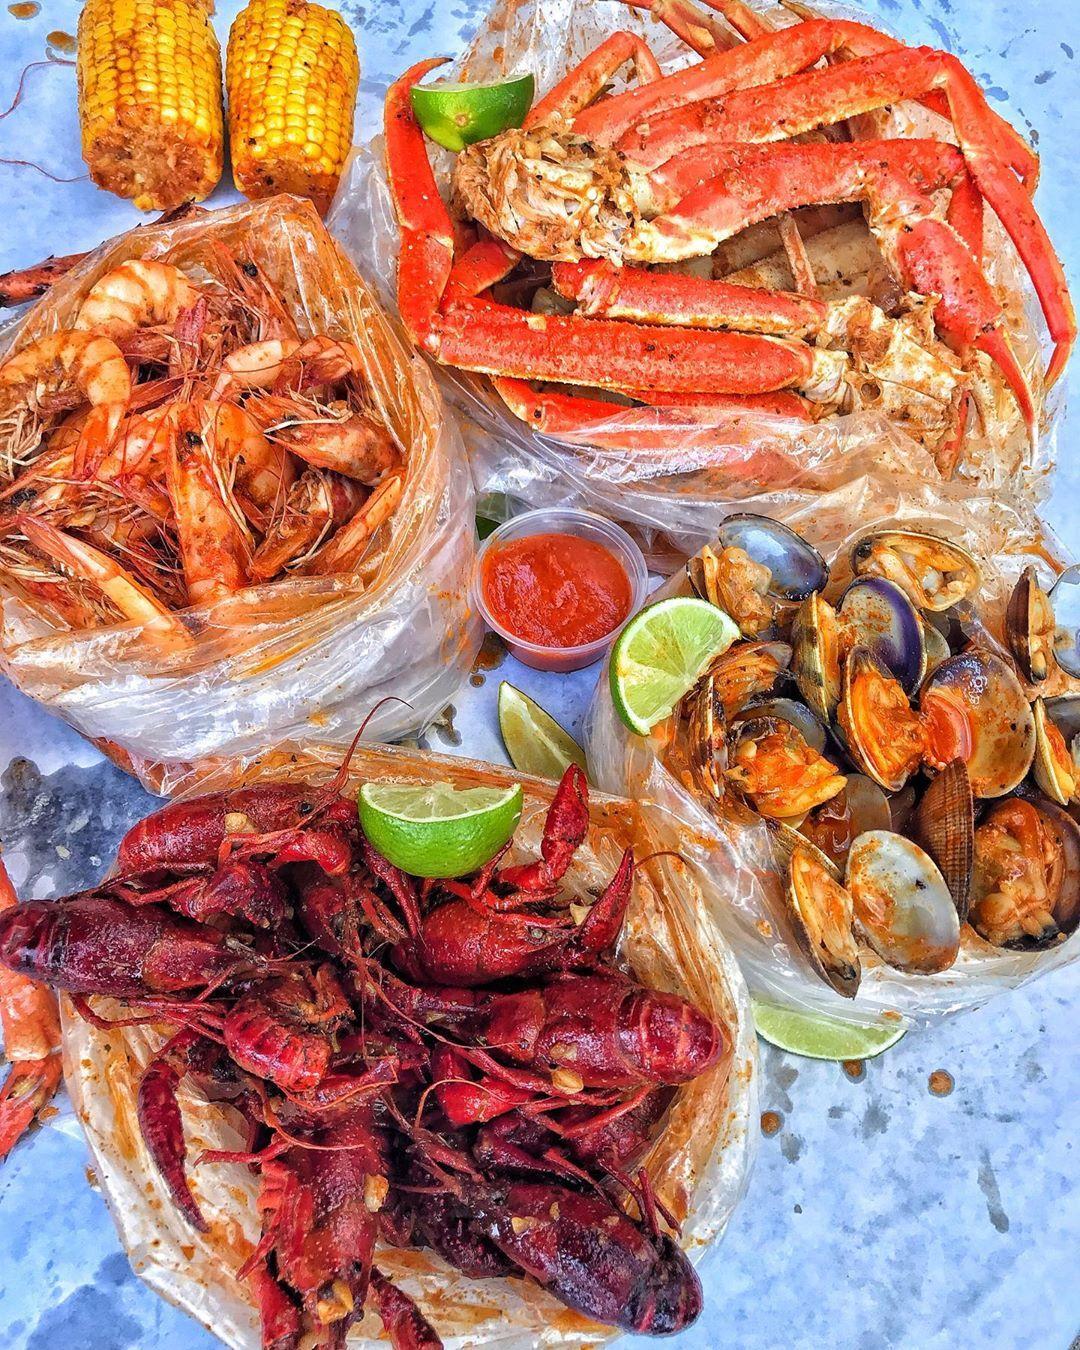 The Kickin Crab On Instagram The Kickin Crab Now This Is A Meal Crawfish Shrimp Crab Ki Seafood Recipes Food Cajun Recipes Easy